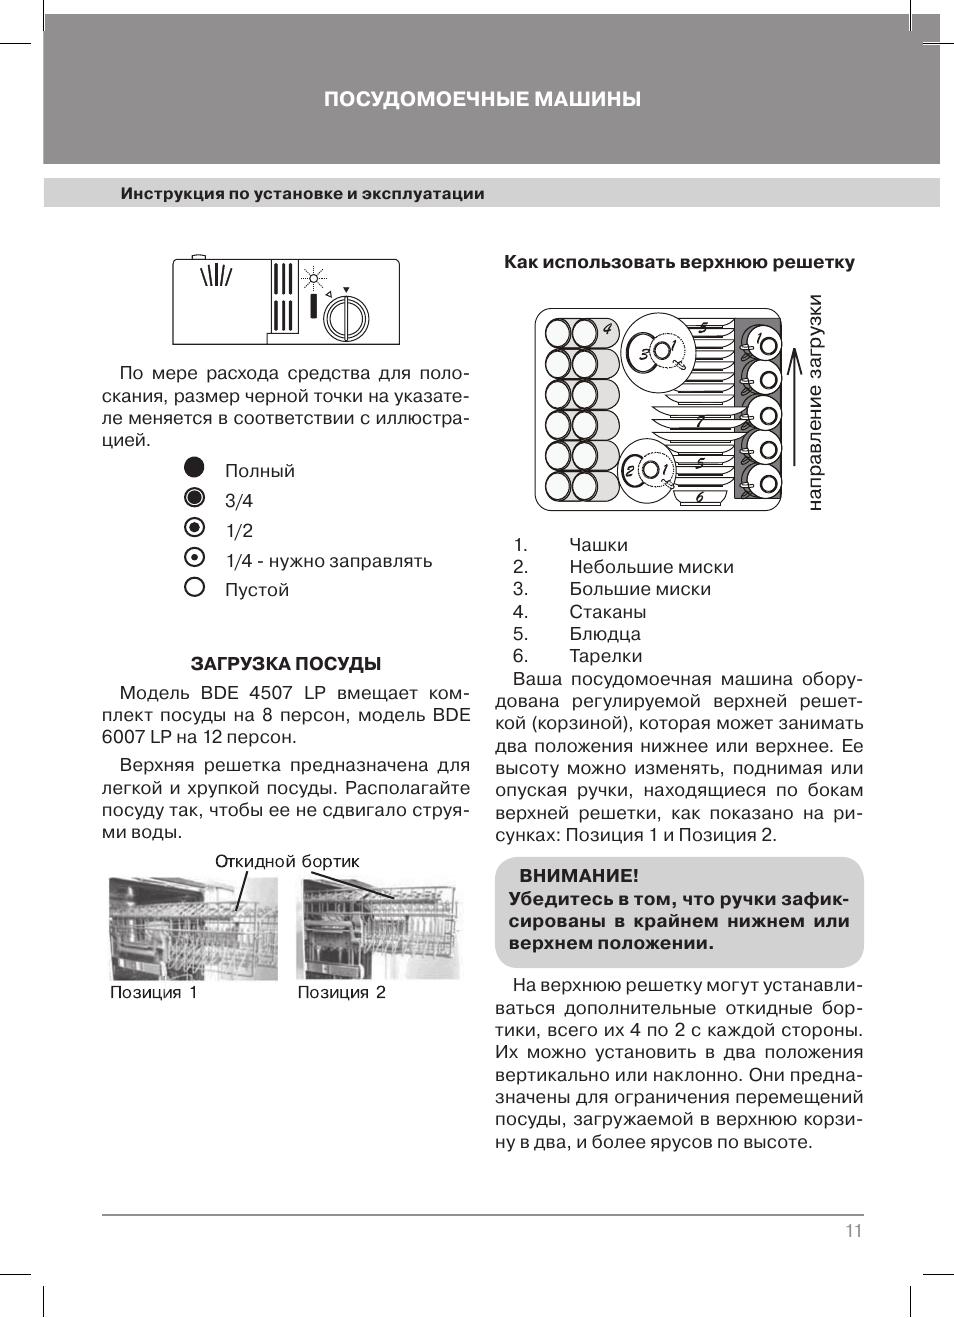 Samsung ck-5085zr схема